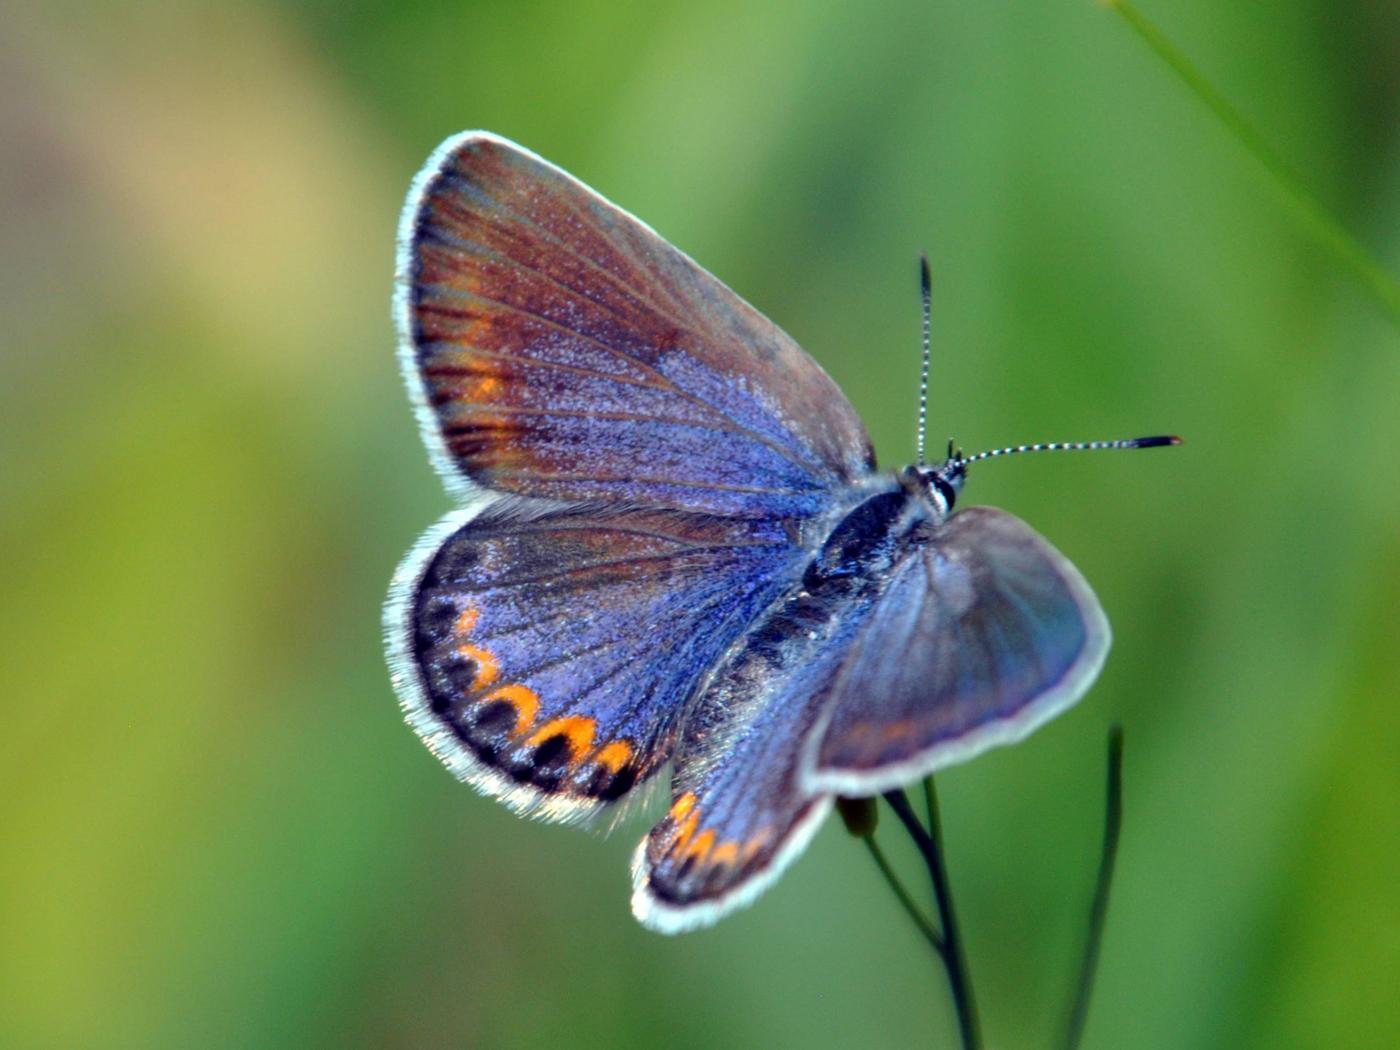 Necedah National Wildlife RefugeFemale Blue Karner Butterfly on Necedah National Wildlife Refuge